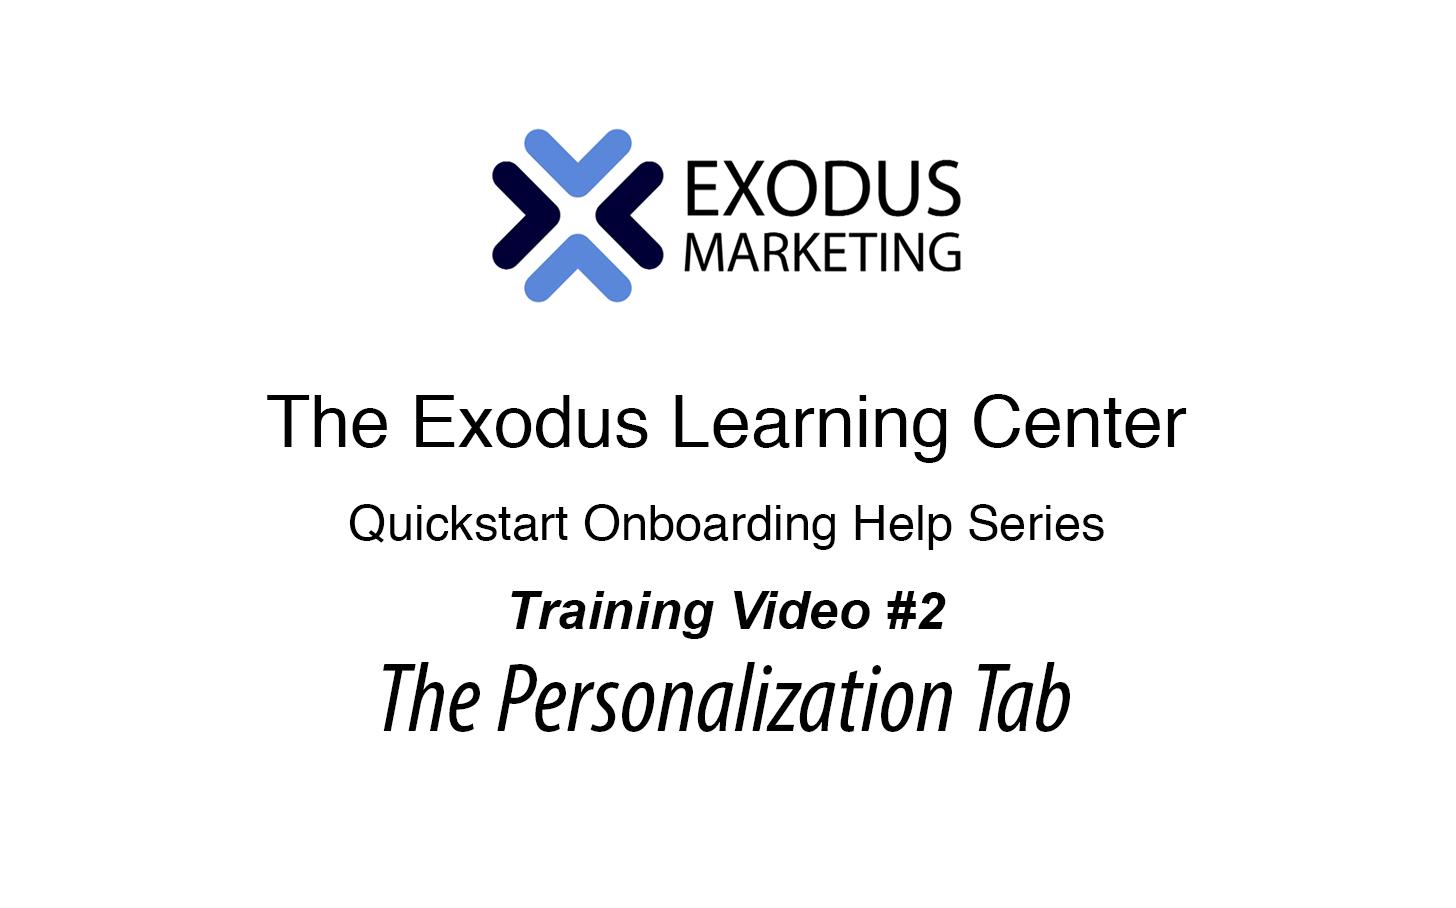 #2 UnderstandingThe Personalization Tab